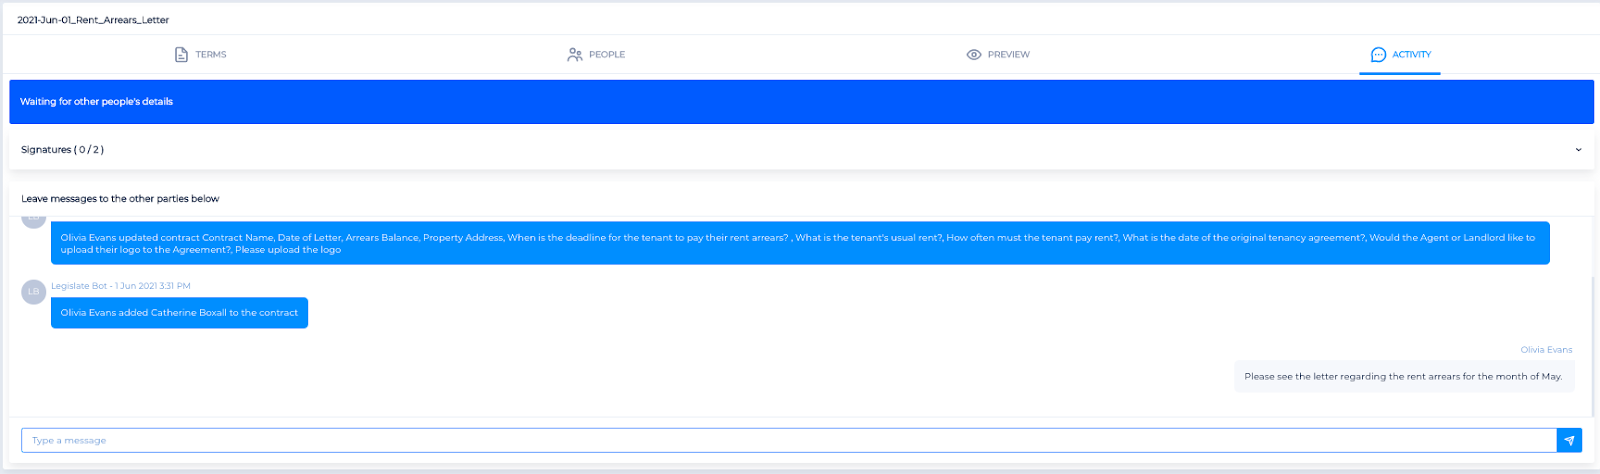 Screenshot of the Legislate activity tab